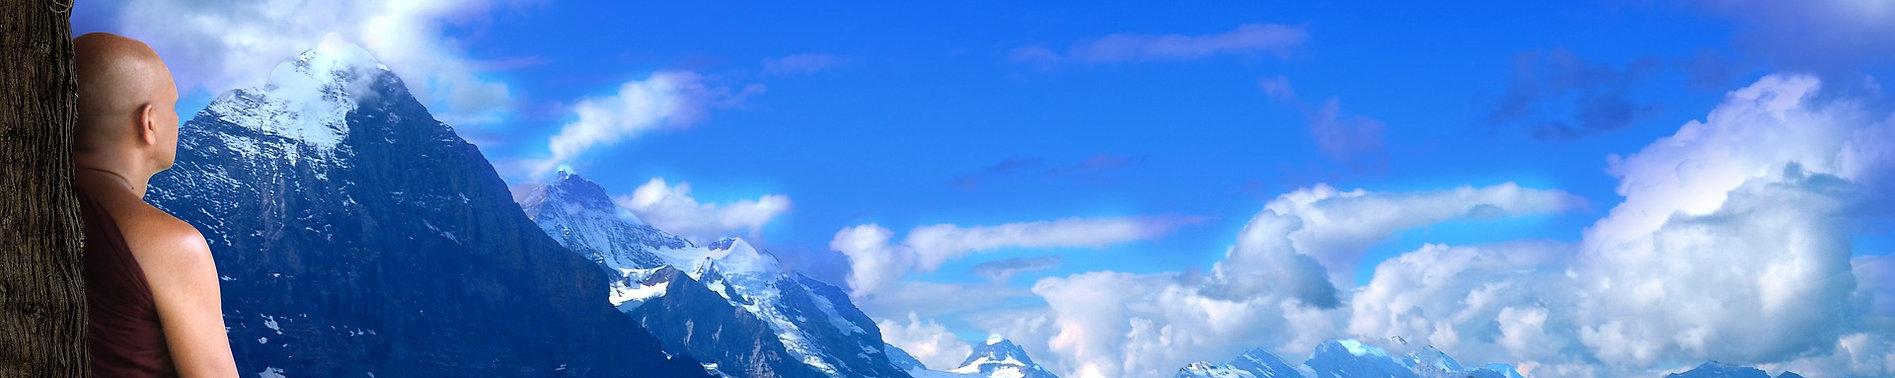 mountain-3079611_1920.jpg